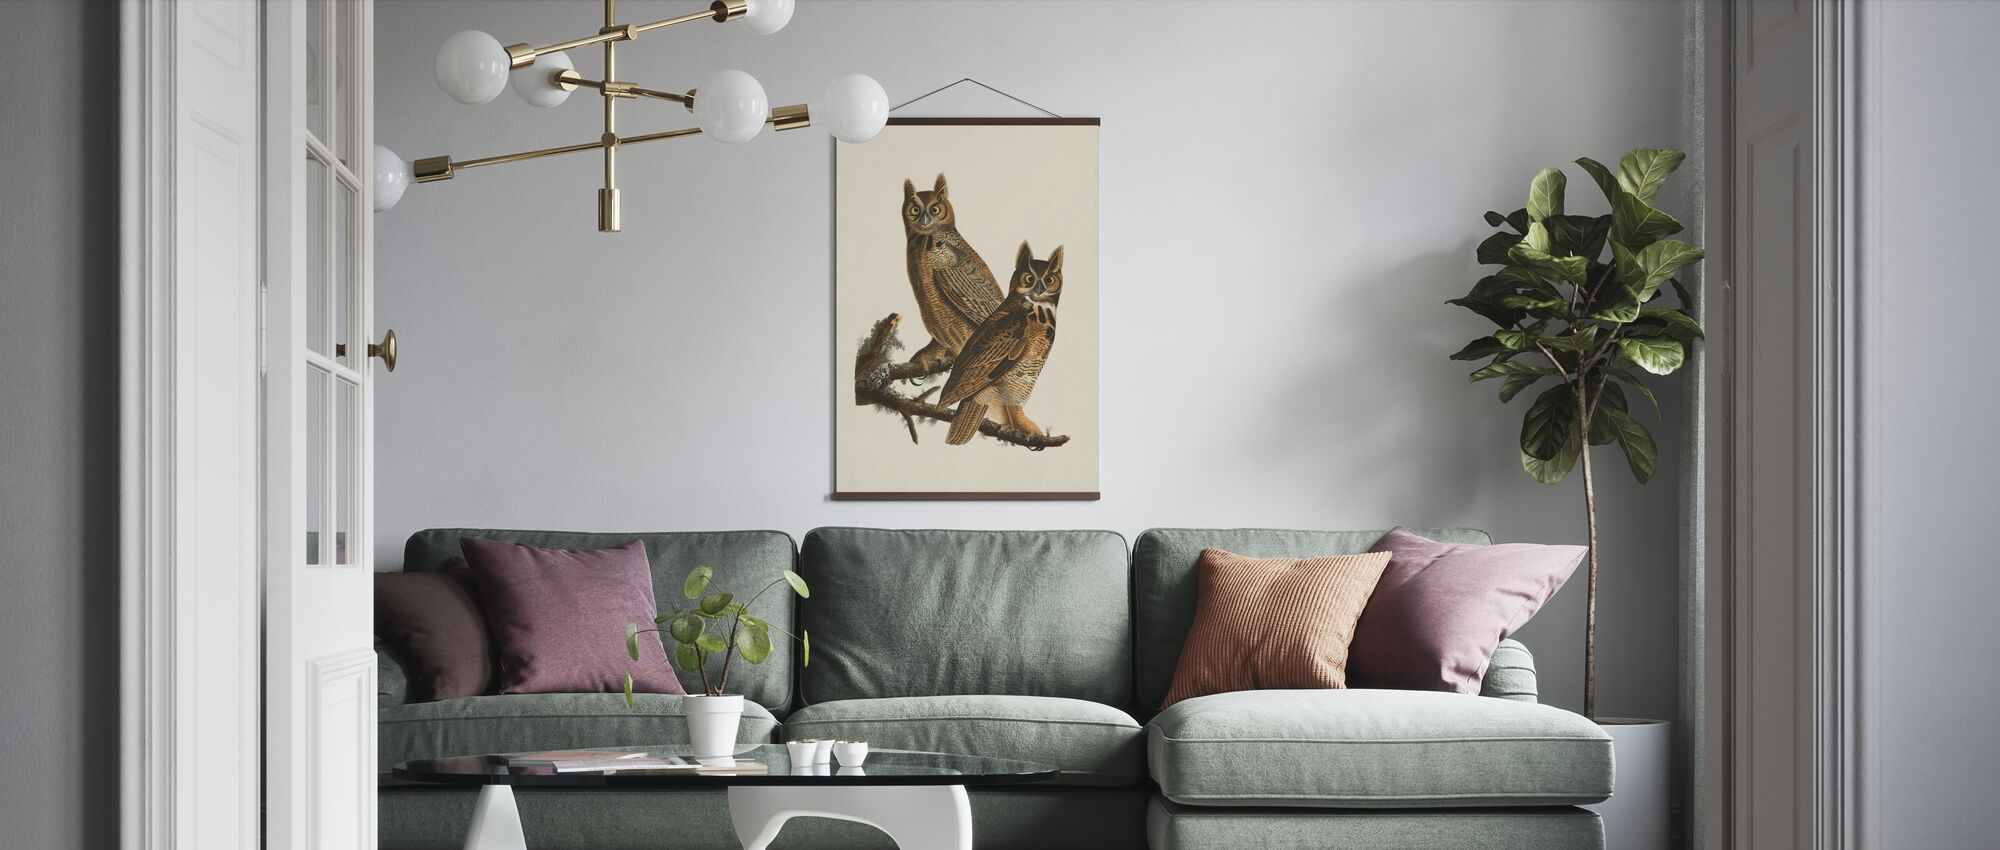 Great Horned Owl - Poster - Living Room